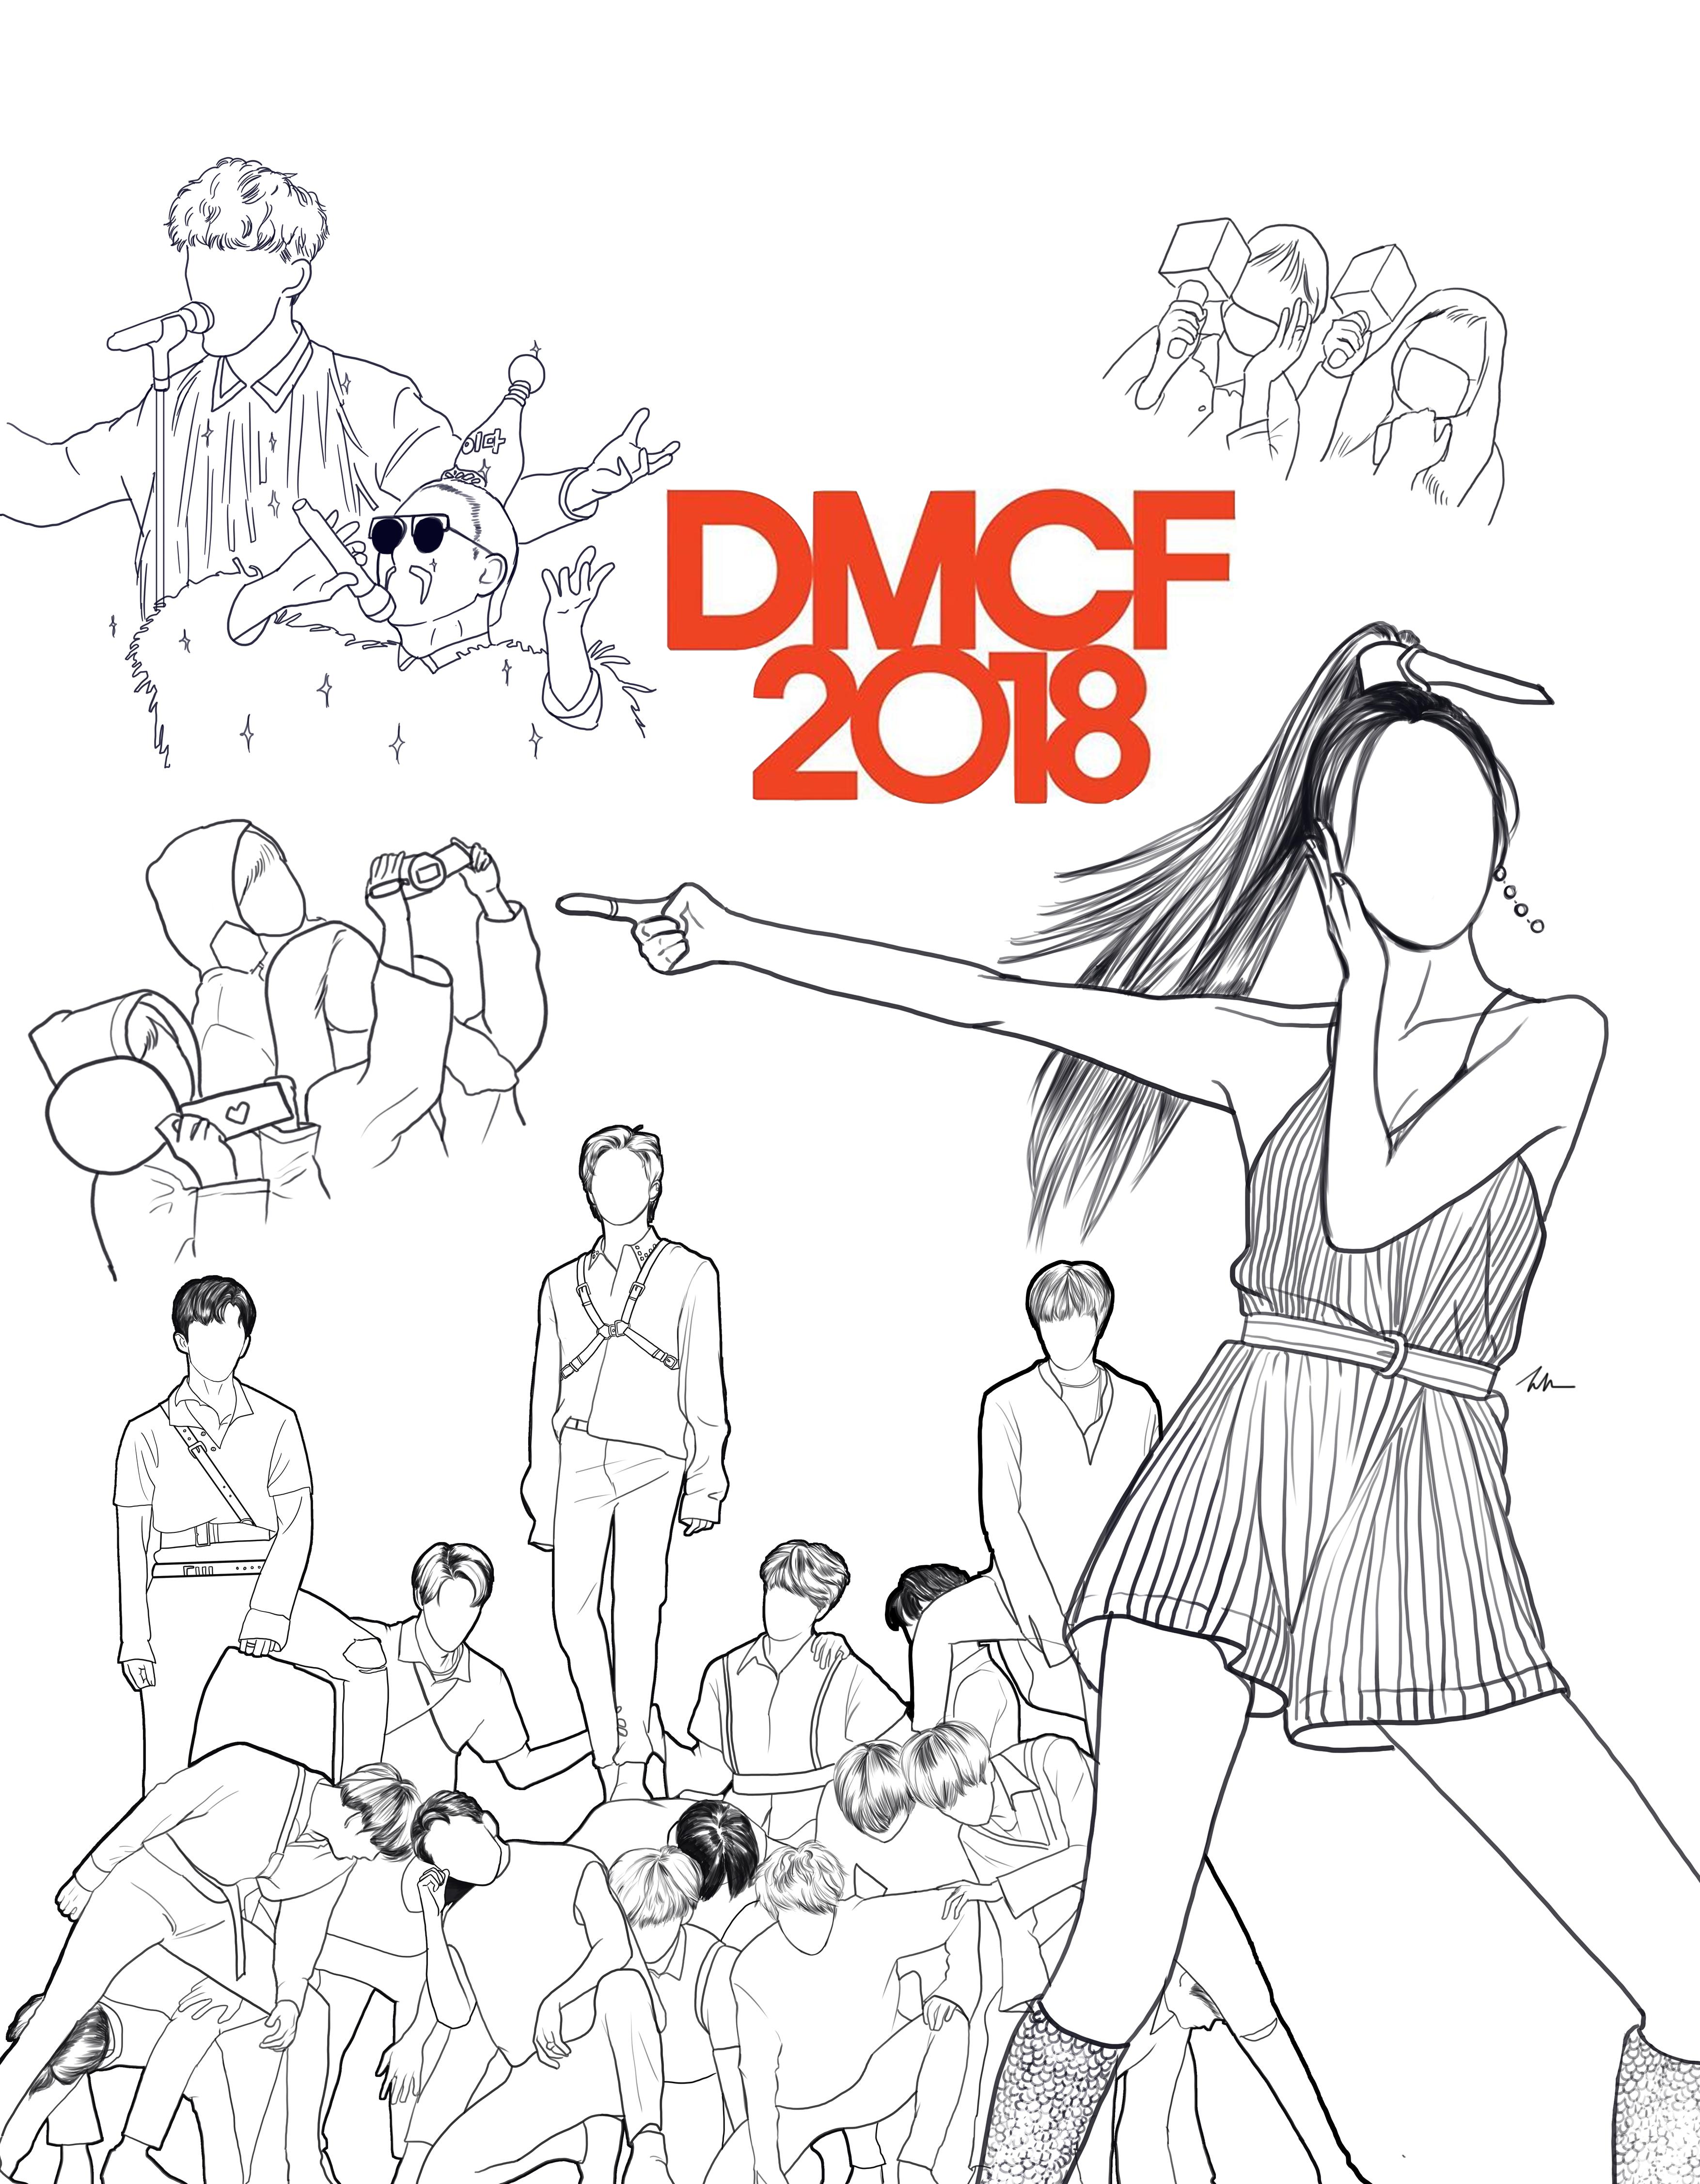 K-POP과 사람들 - DMCF 2018 코리안 뮤직 웨이브 후기